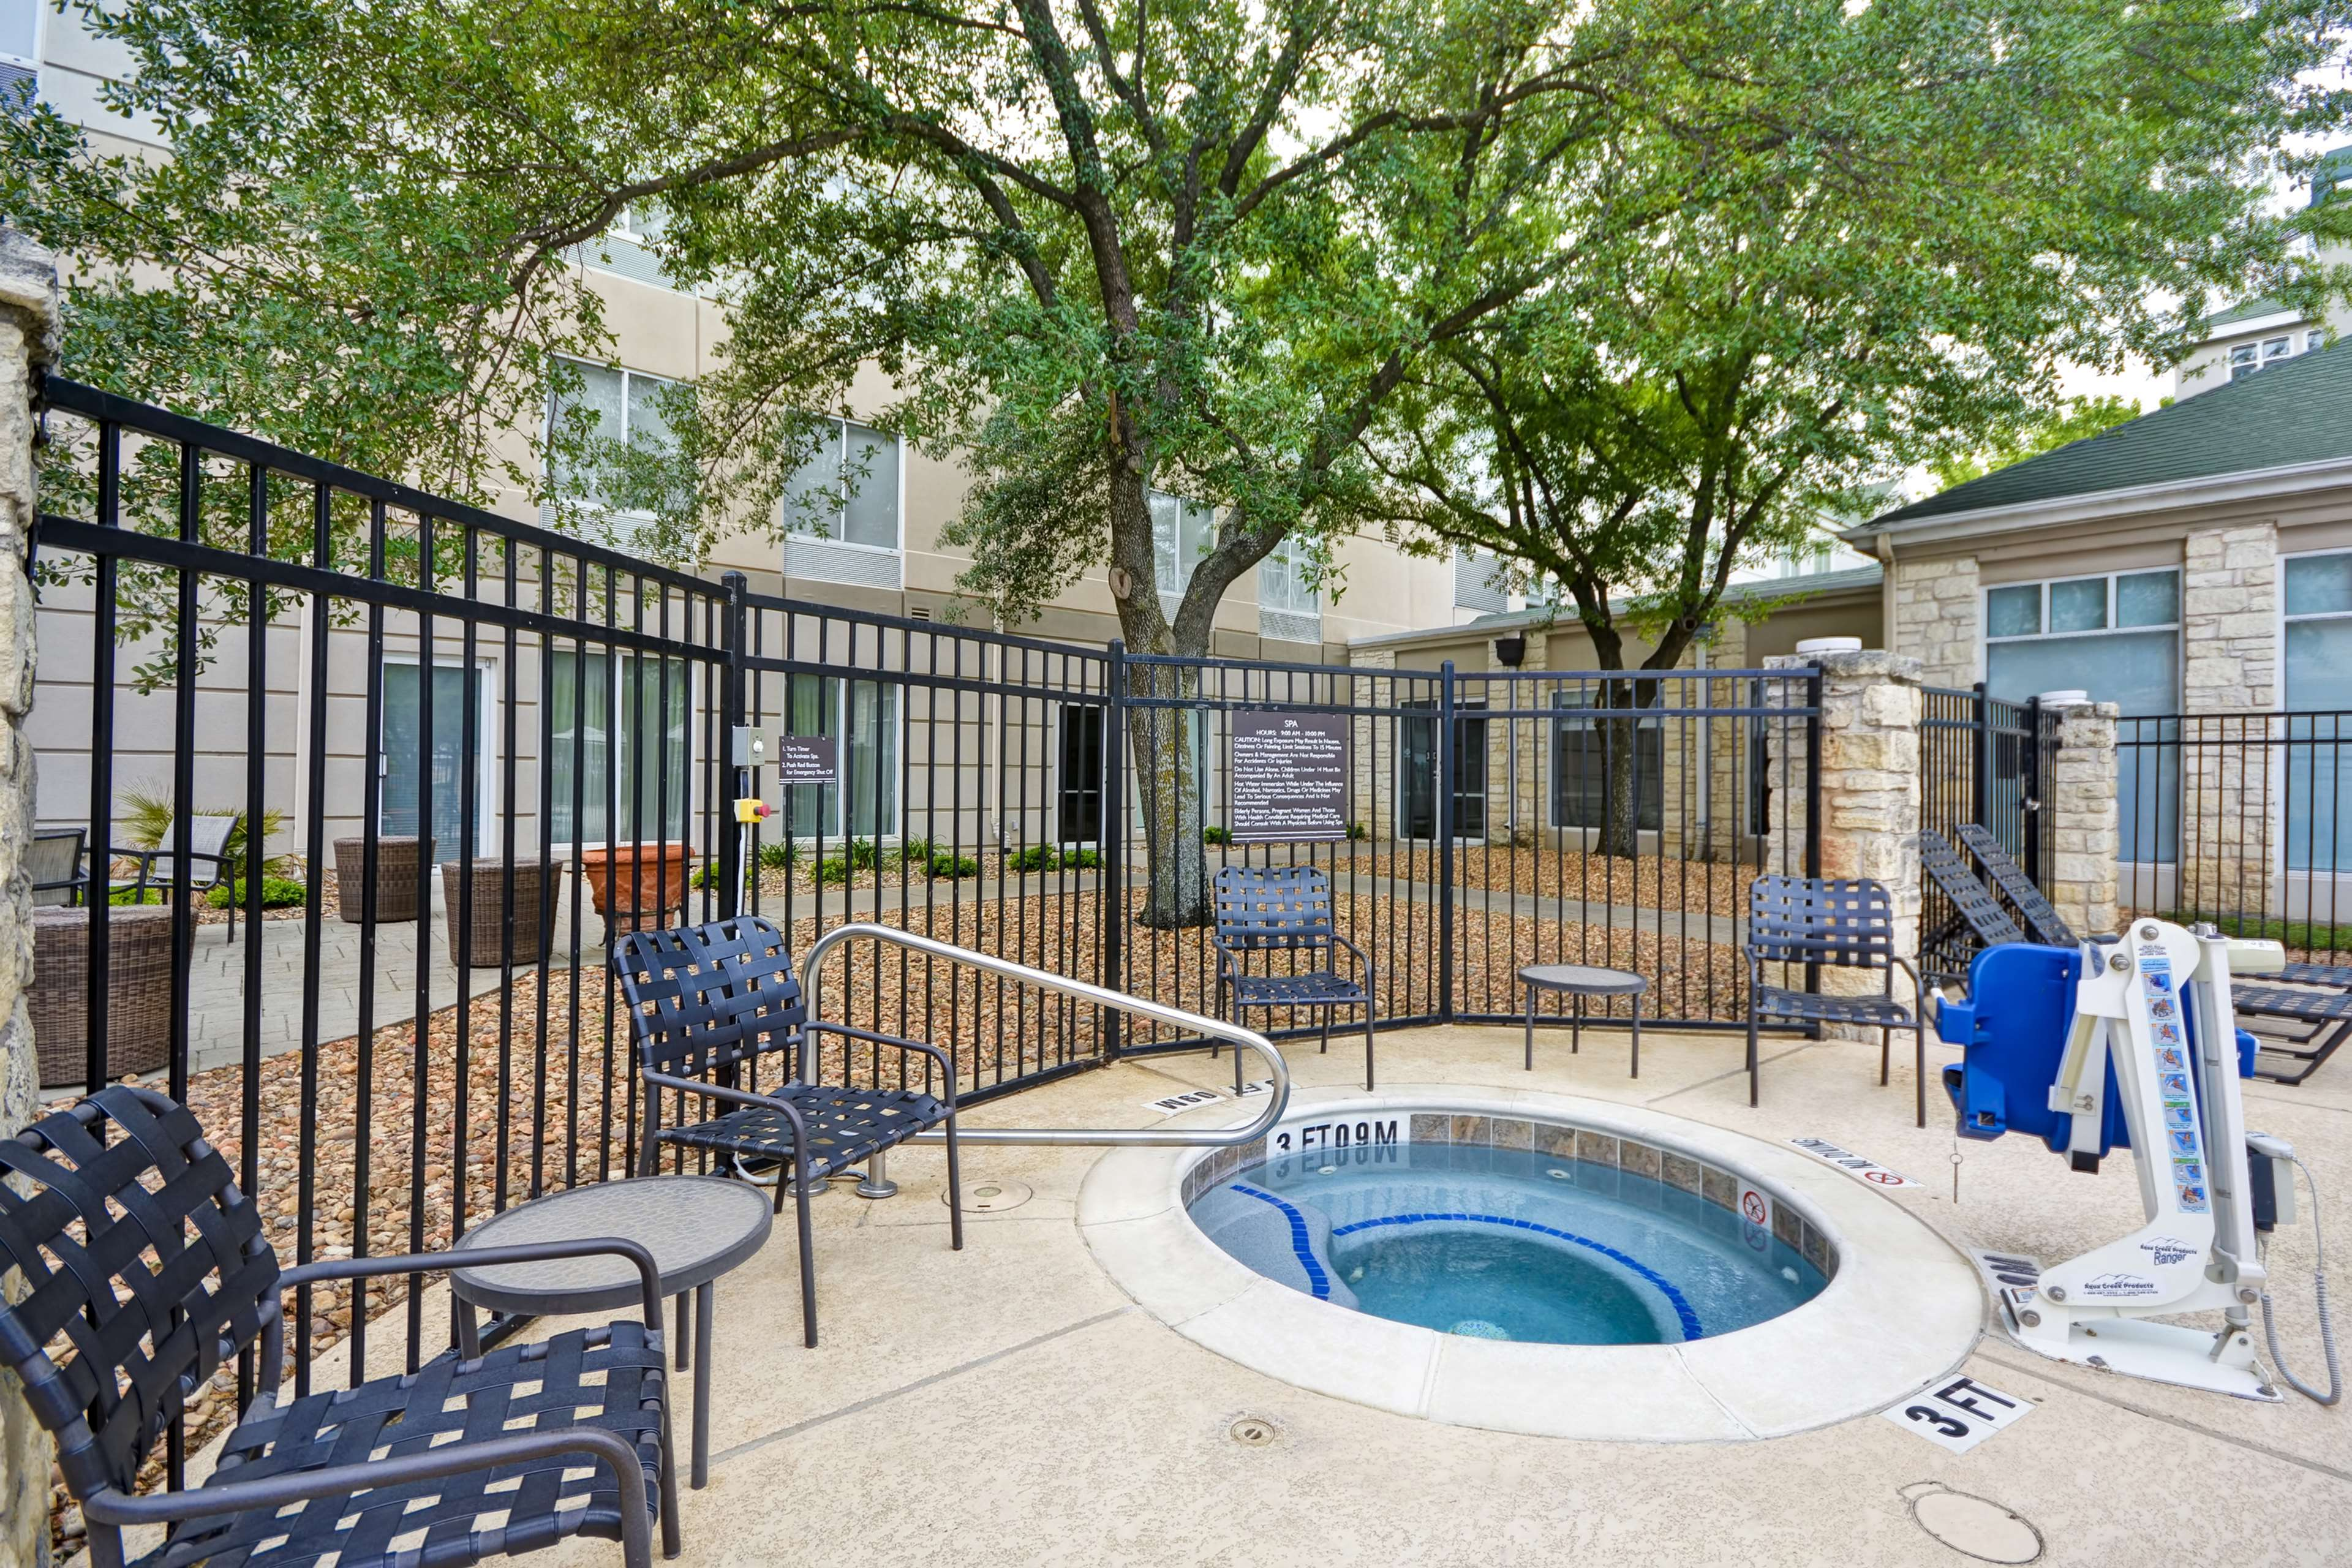 Hilton Garden Inn Austin/Round Rock image 46